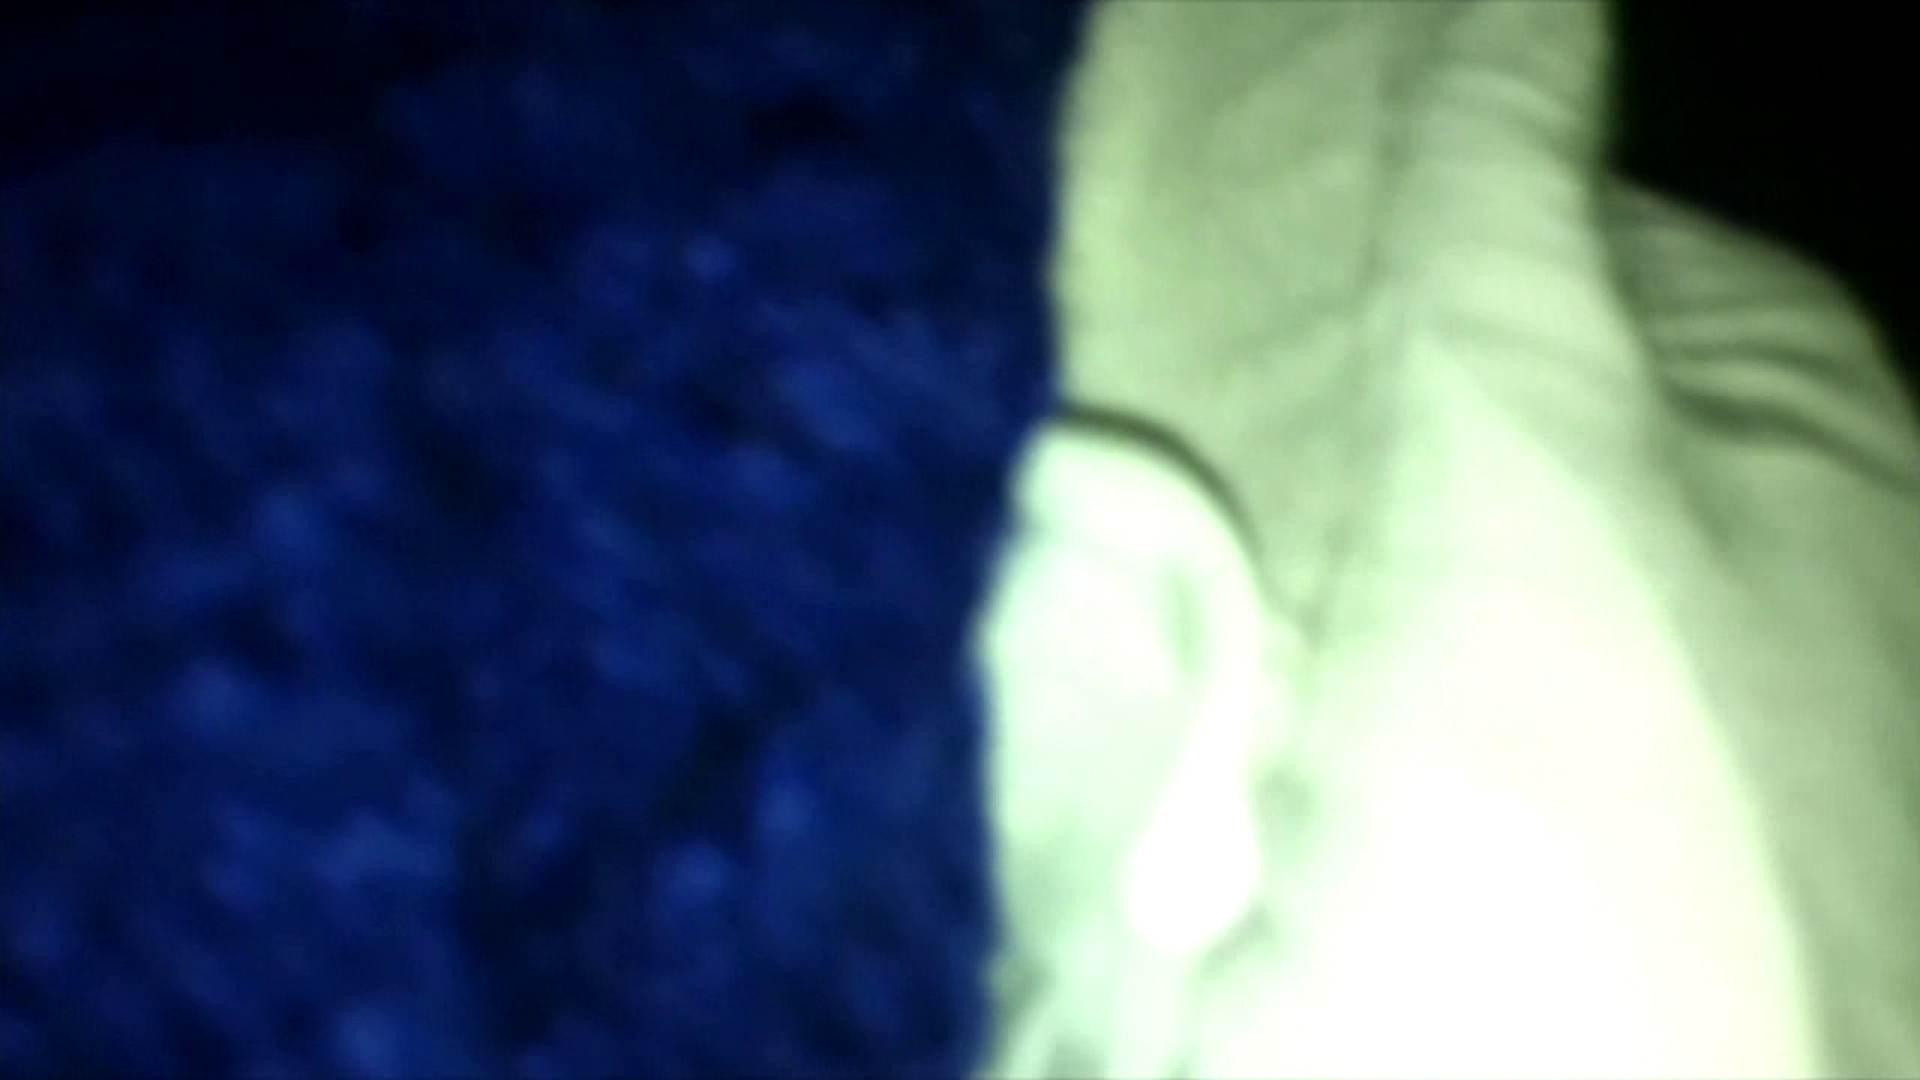 vol.22 【YHちゃん】パルコ店員20歳 mixiオフ会で イタズラ AV無料 77画像 22